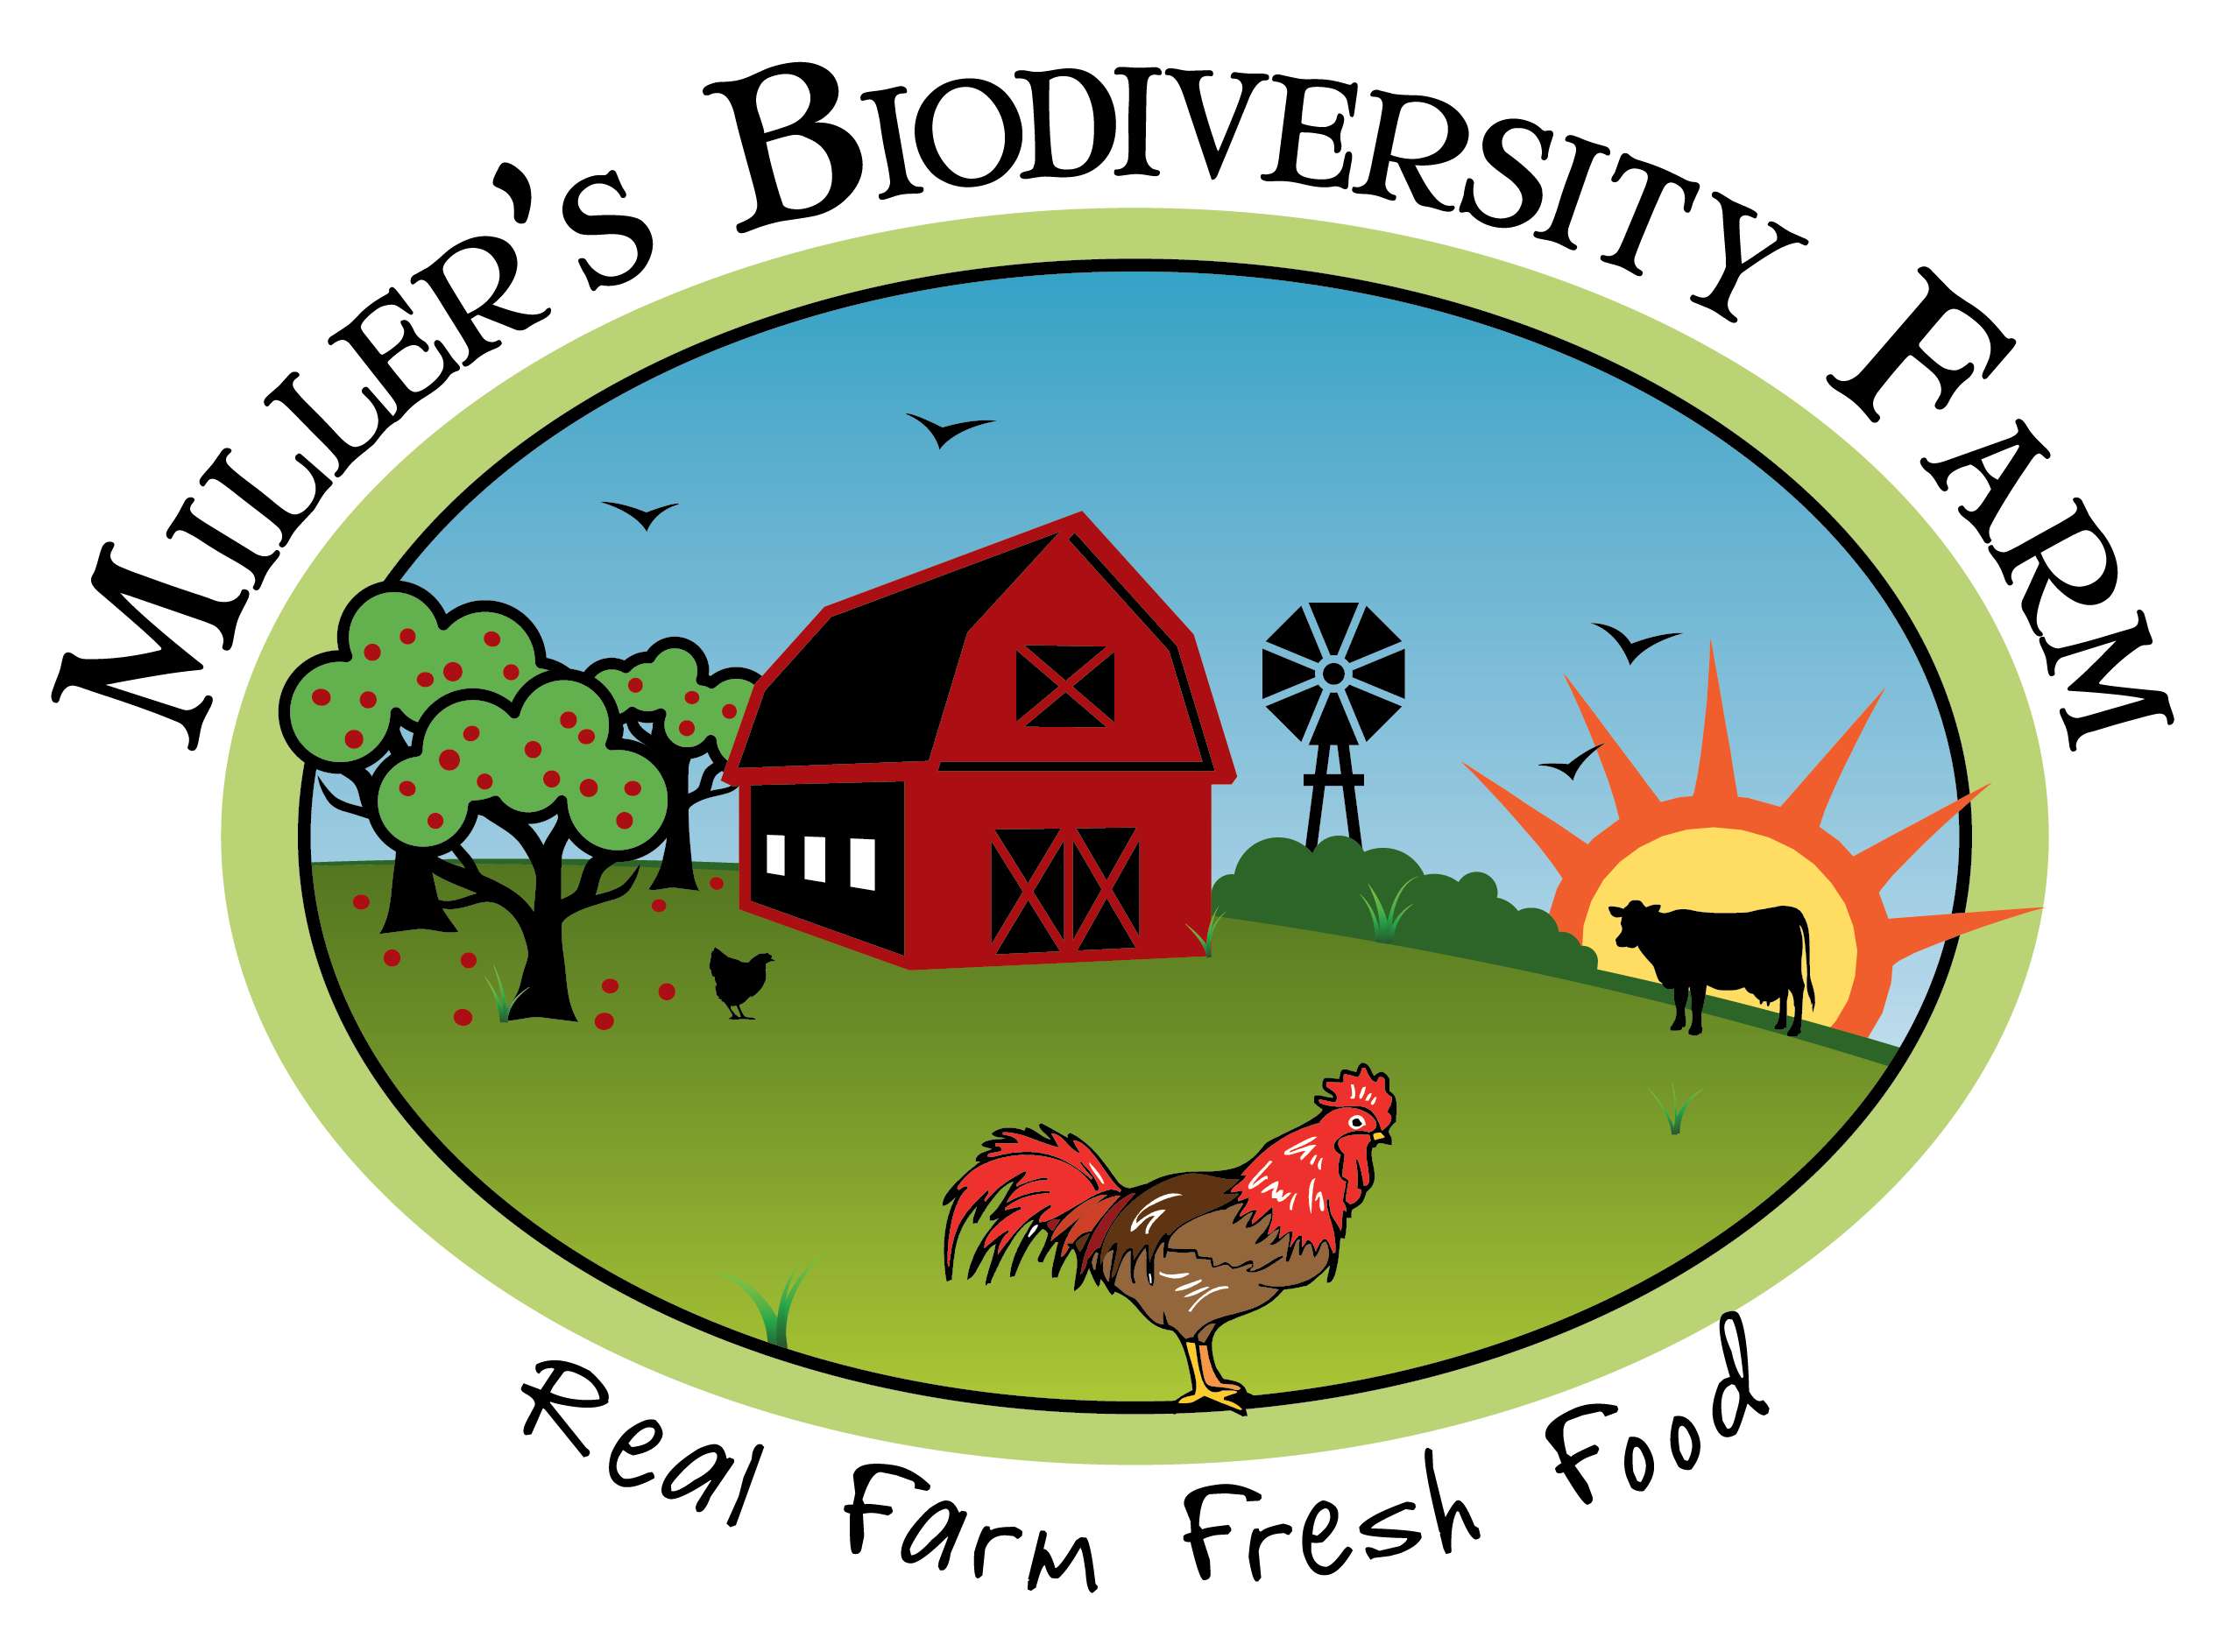 Miller's Biodiversity Farm Logo